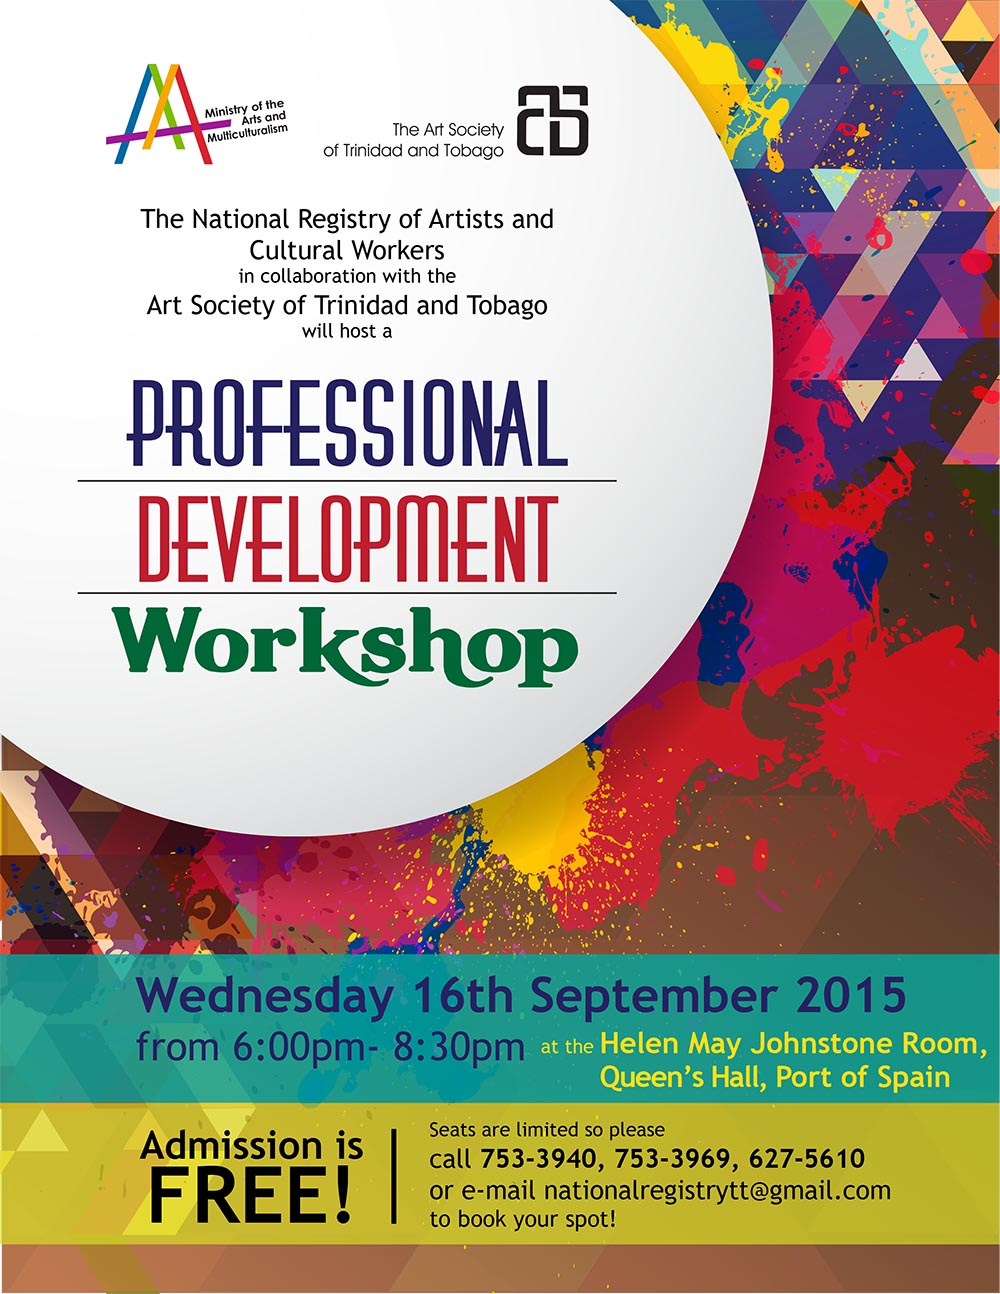 Professional Development Flyer [16-09-2015]